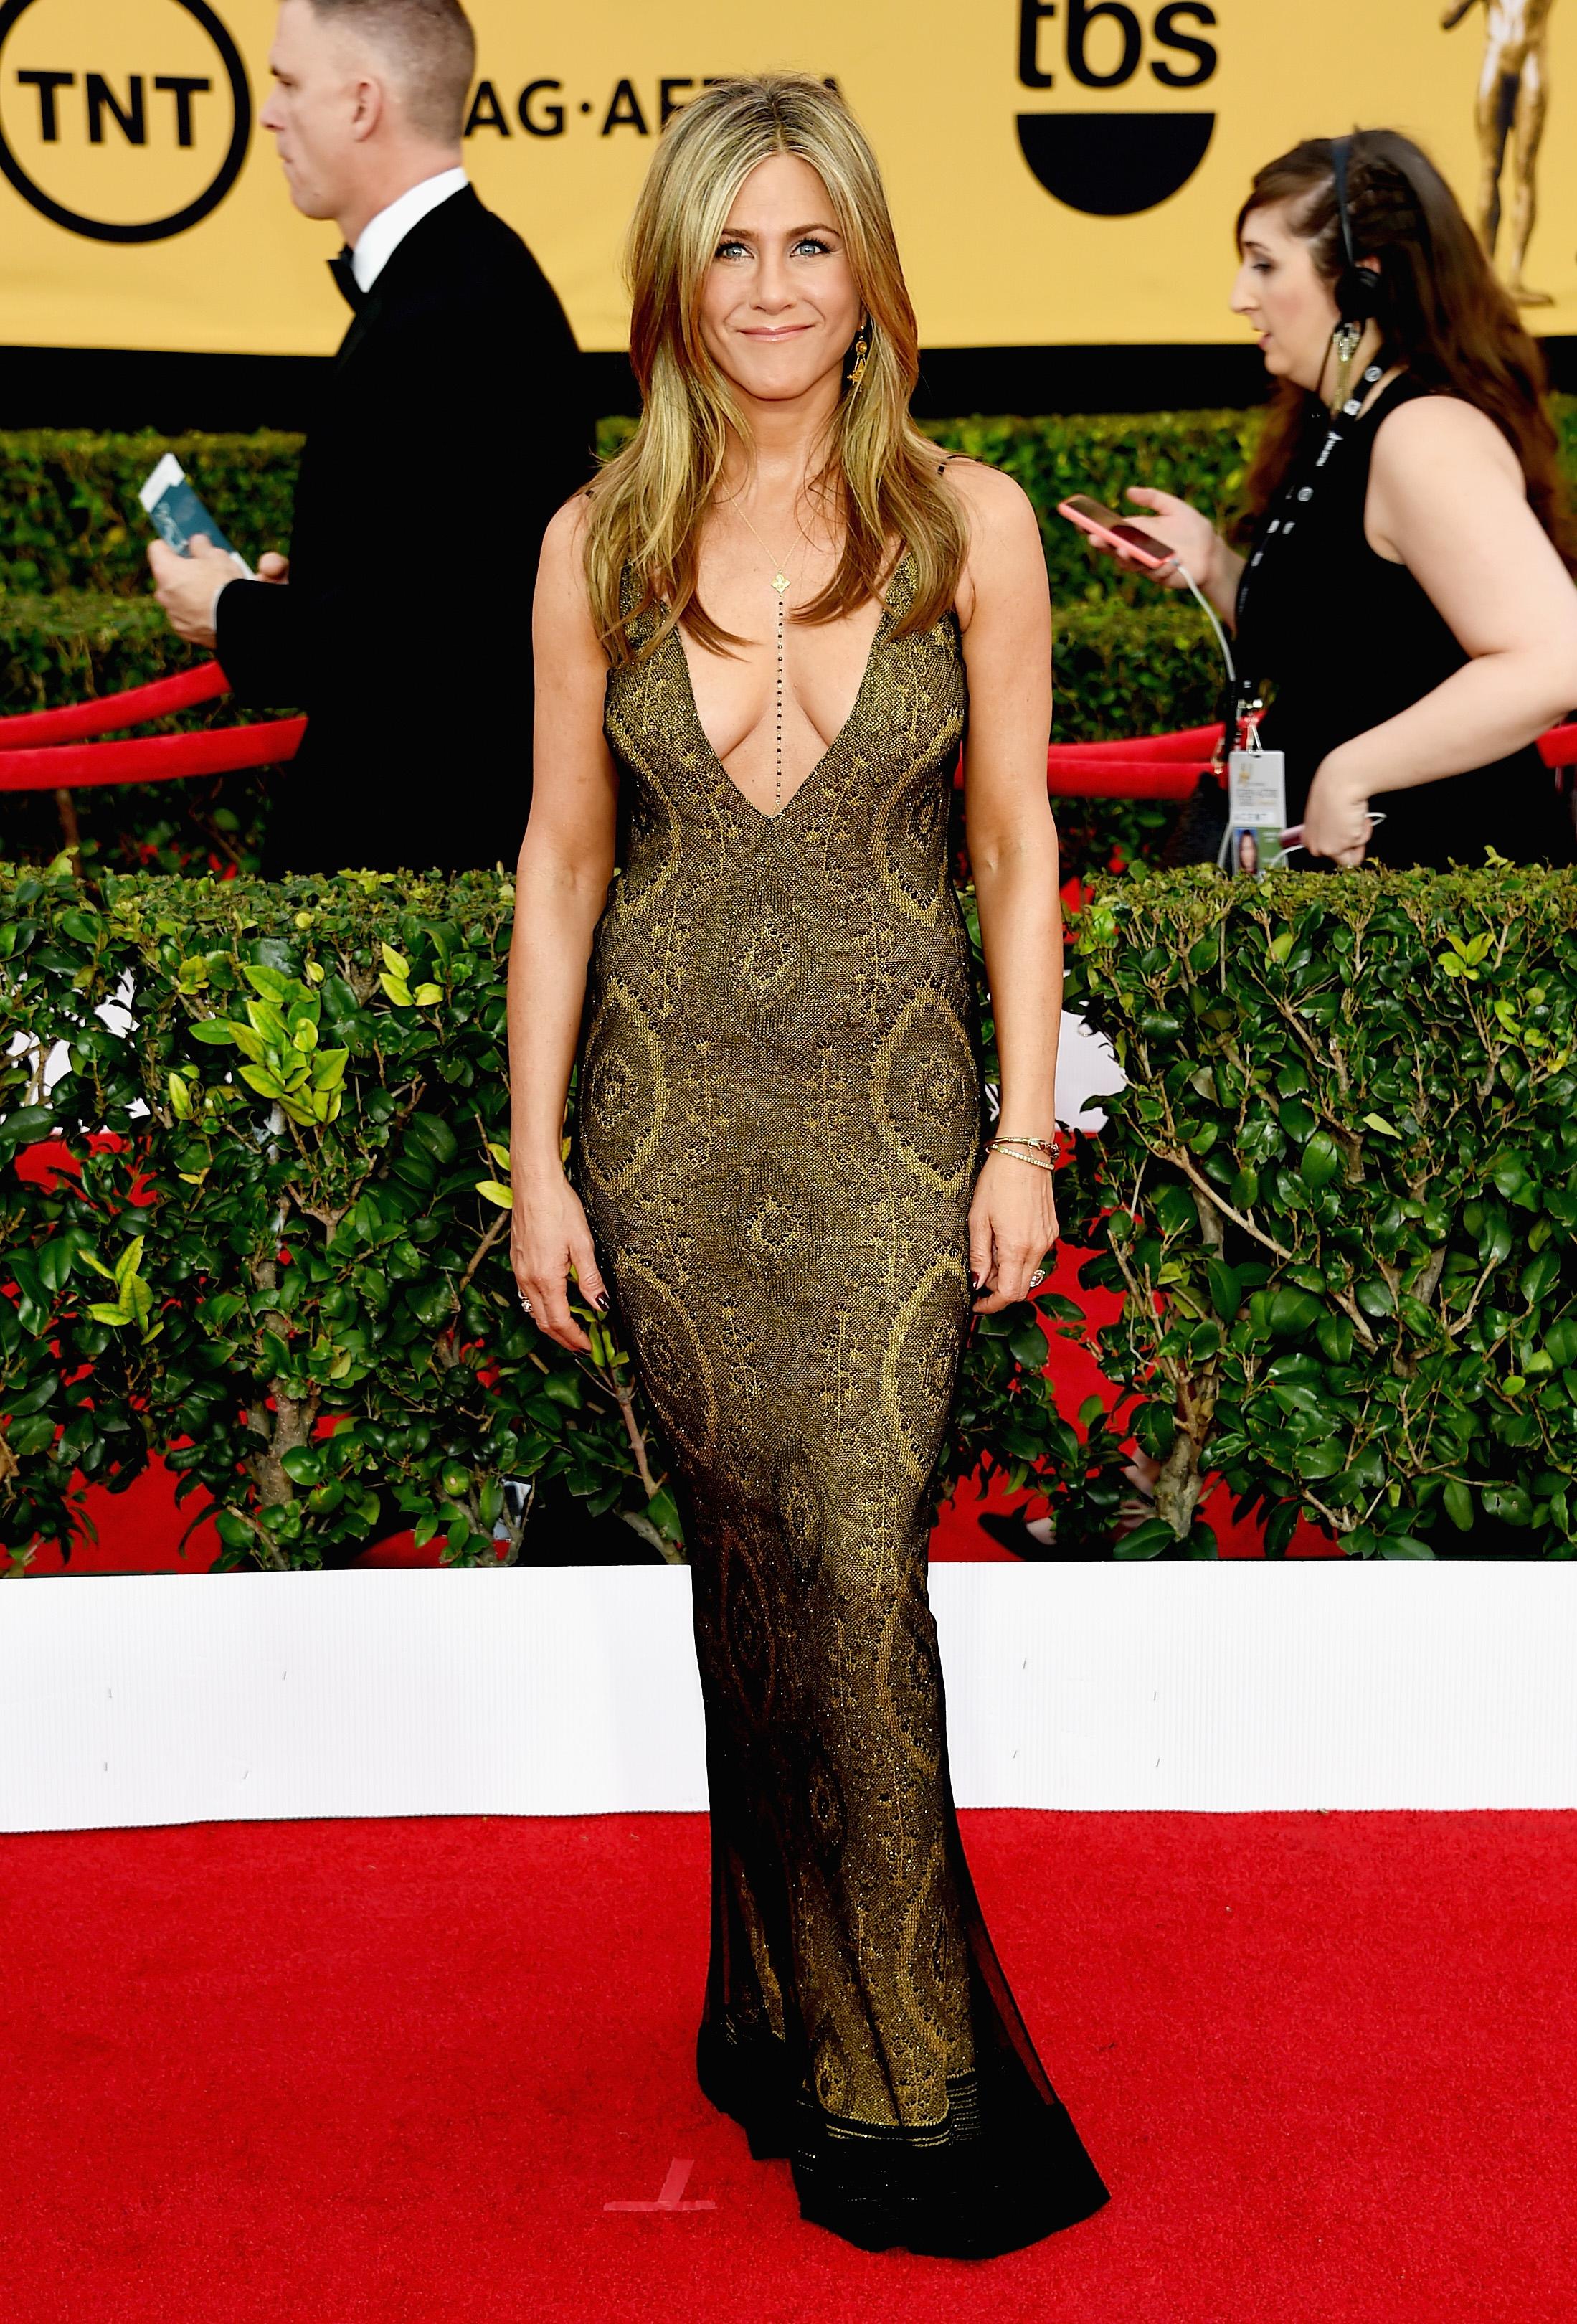 1d52b31b554bf4 How To Wear A Body Chain Like Jennifer Aniston